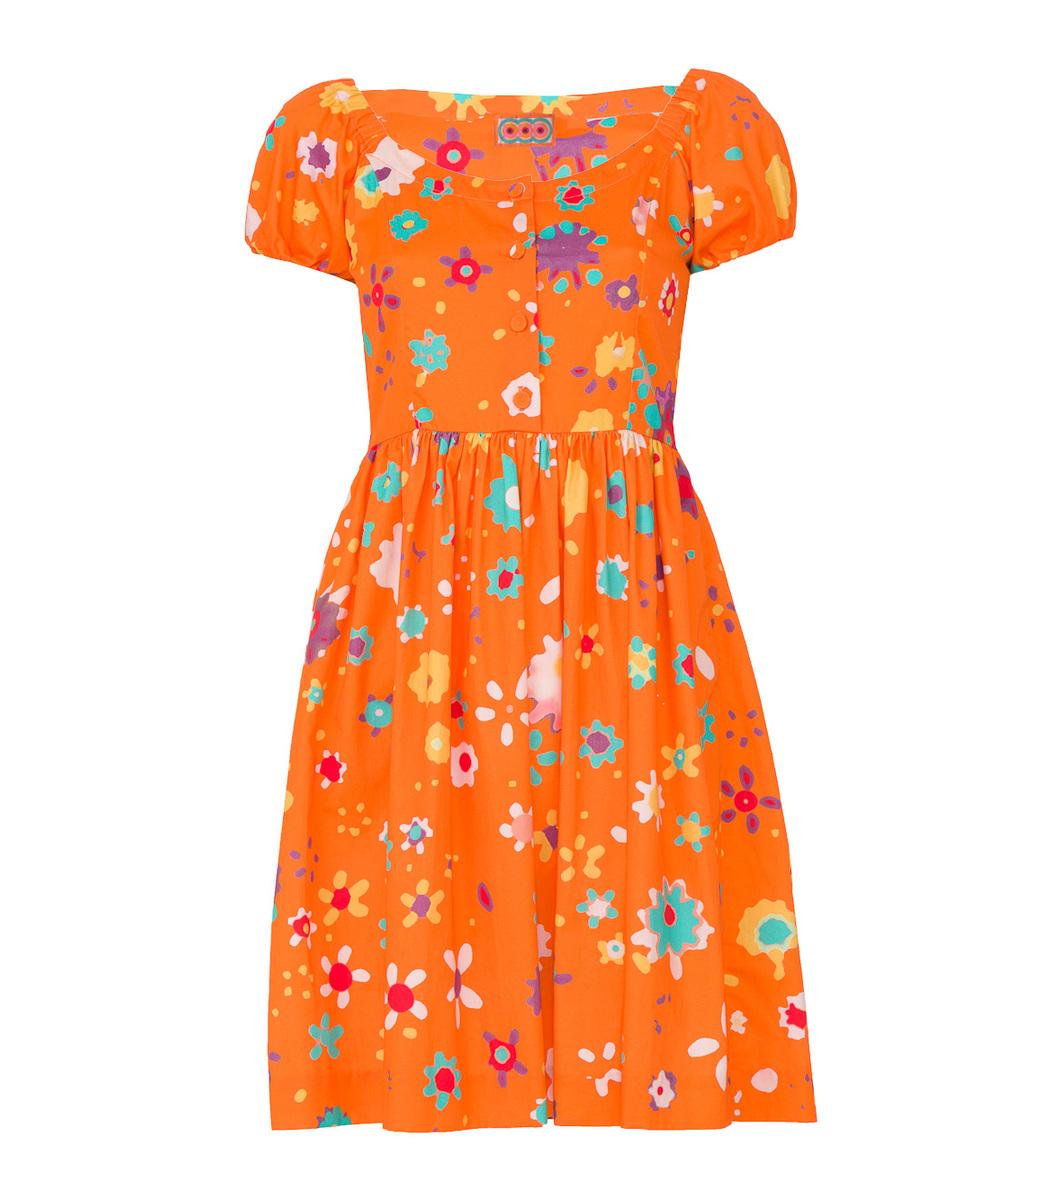 Lhd Orange Coconut Grove Dress